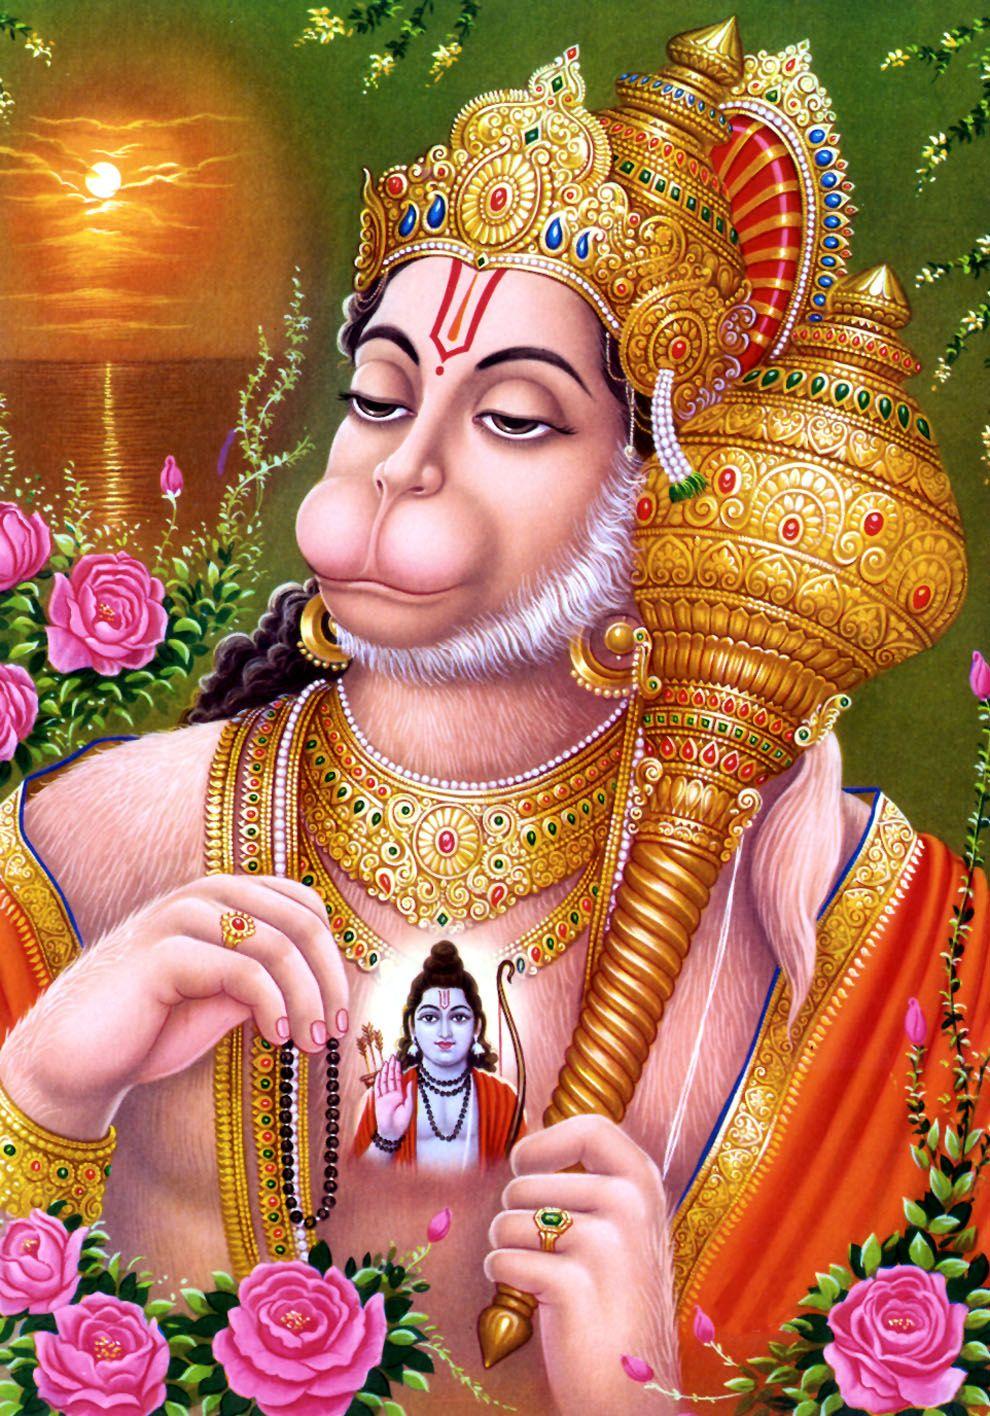 Wallpaper download bhakti - Visit Our Official Hanuman Bhakti Channel And Watch Very Butifull Hanumanji Mahima Song Aarti Bhajan And